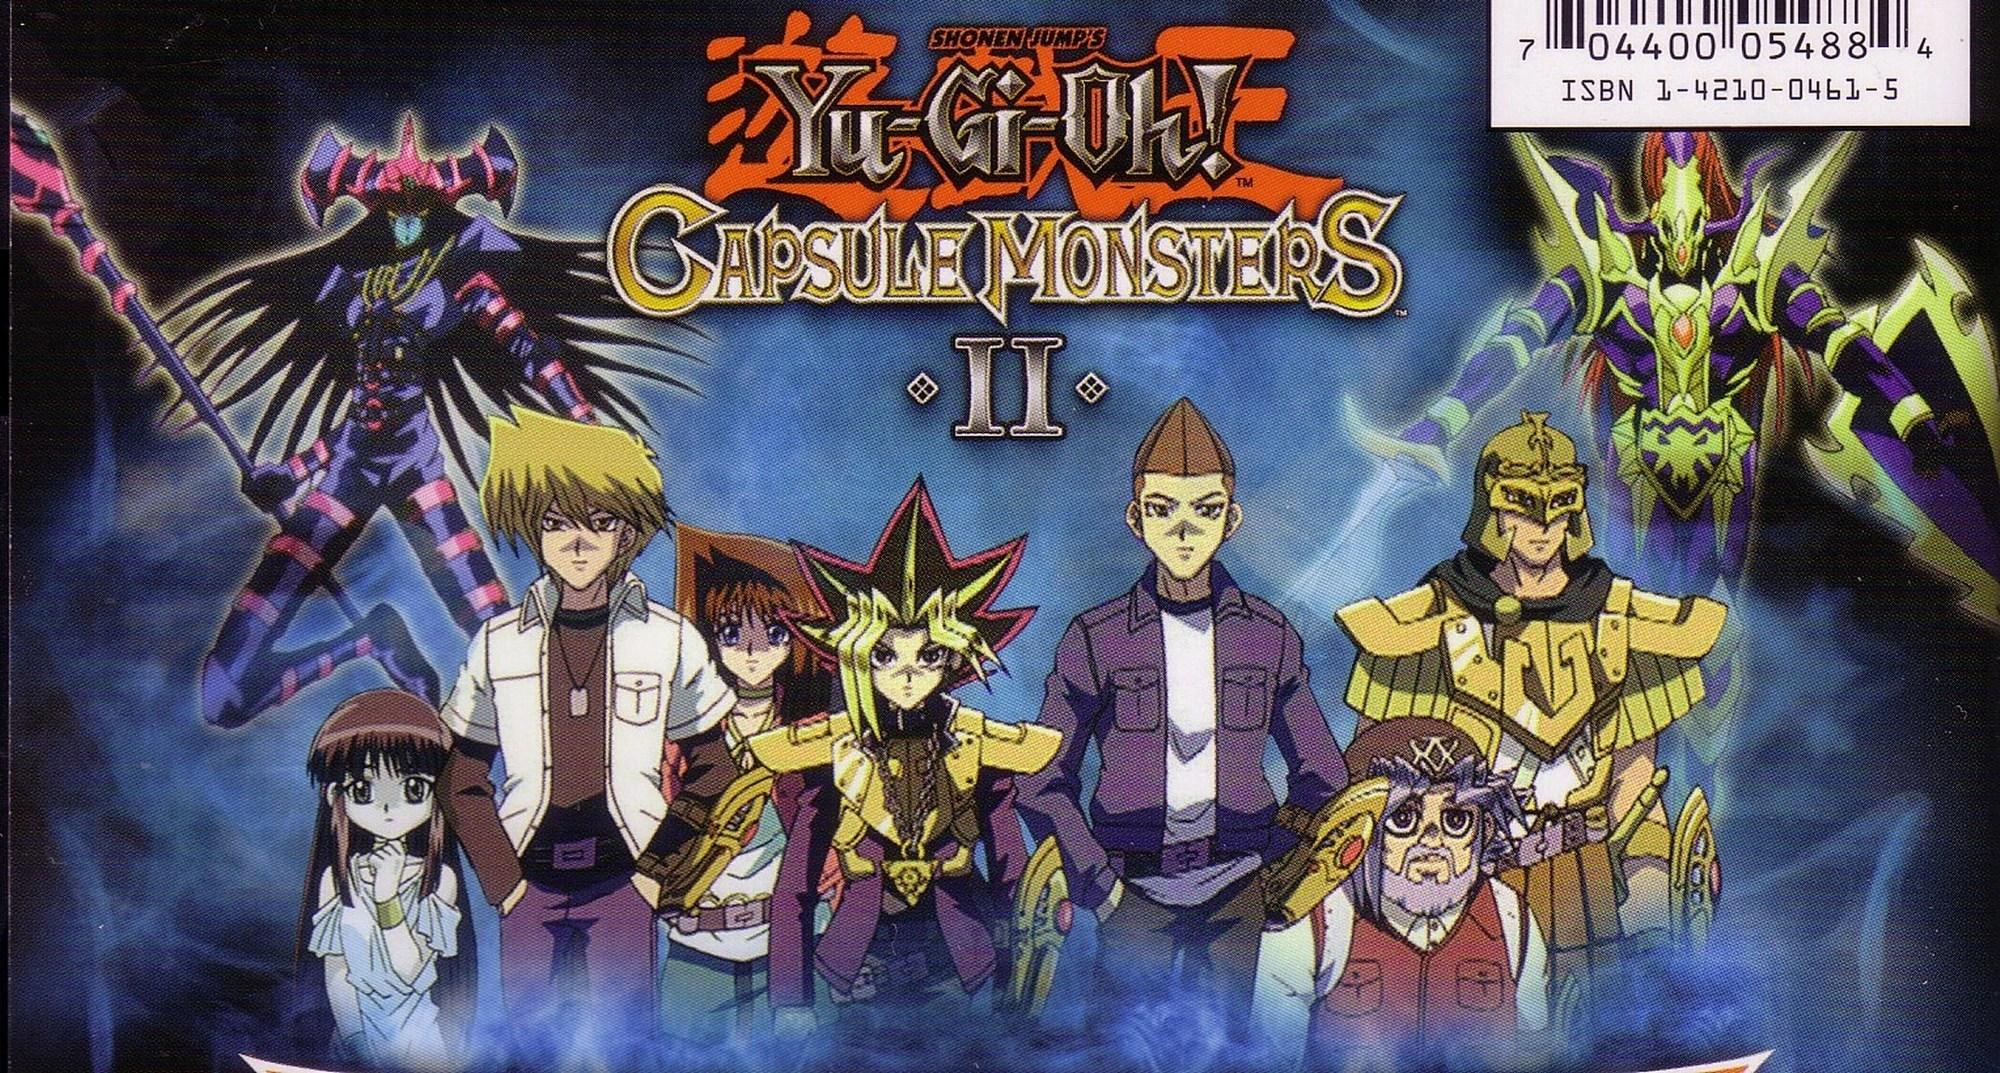 yugioh capsule monsters game